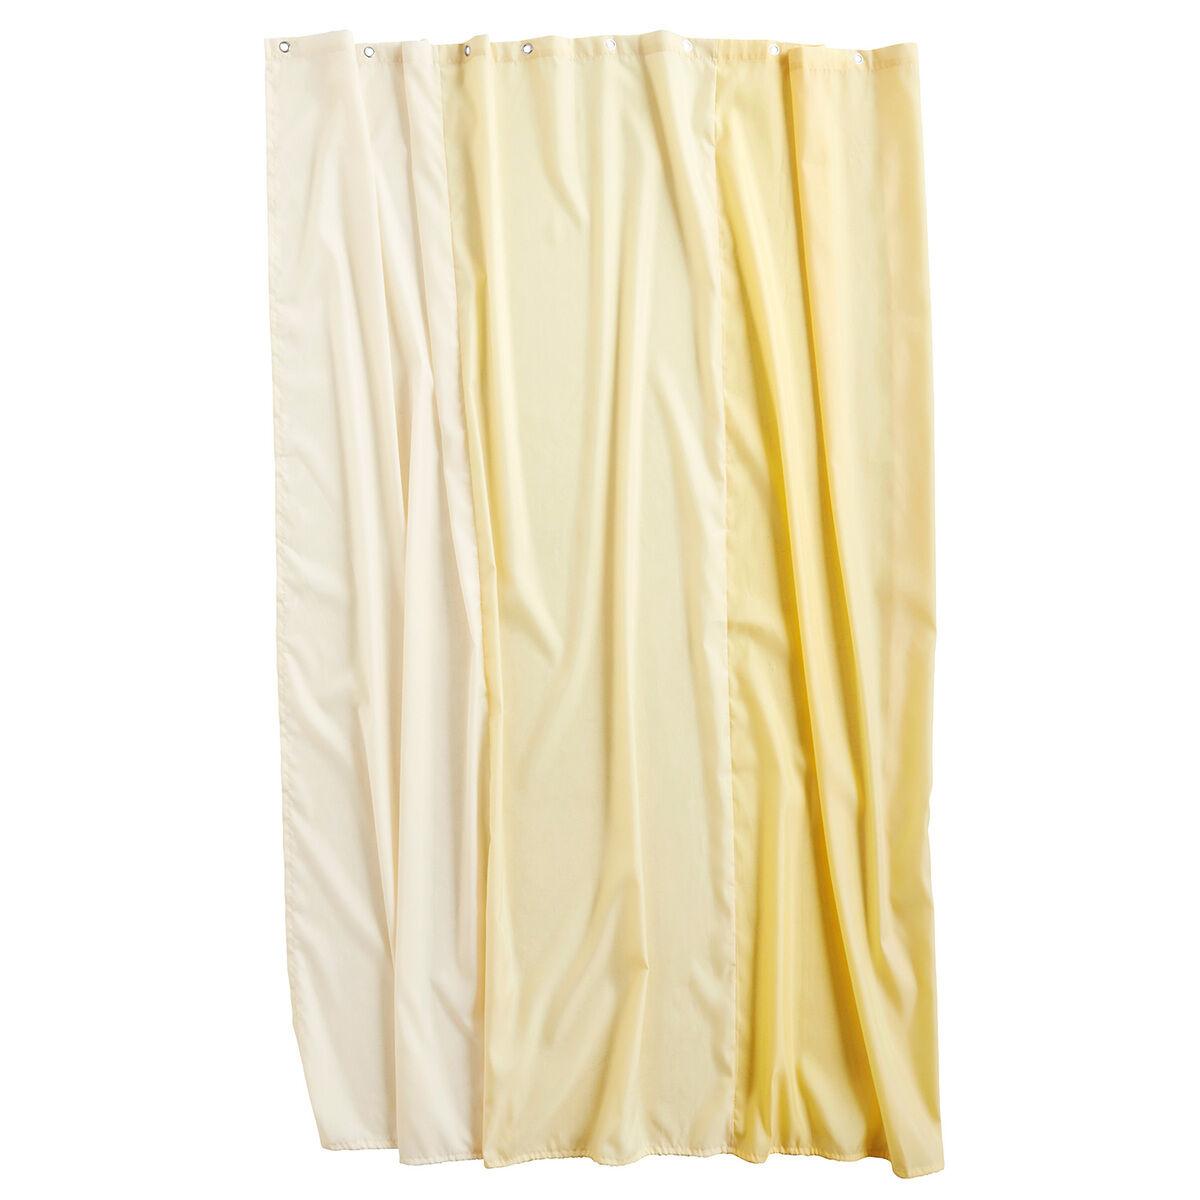 Hay Aquarelle vertical suihkuverho, buttercup